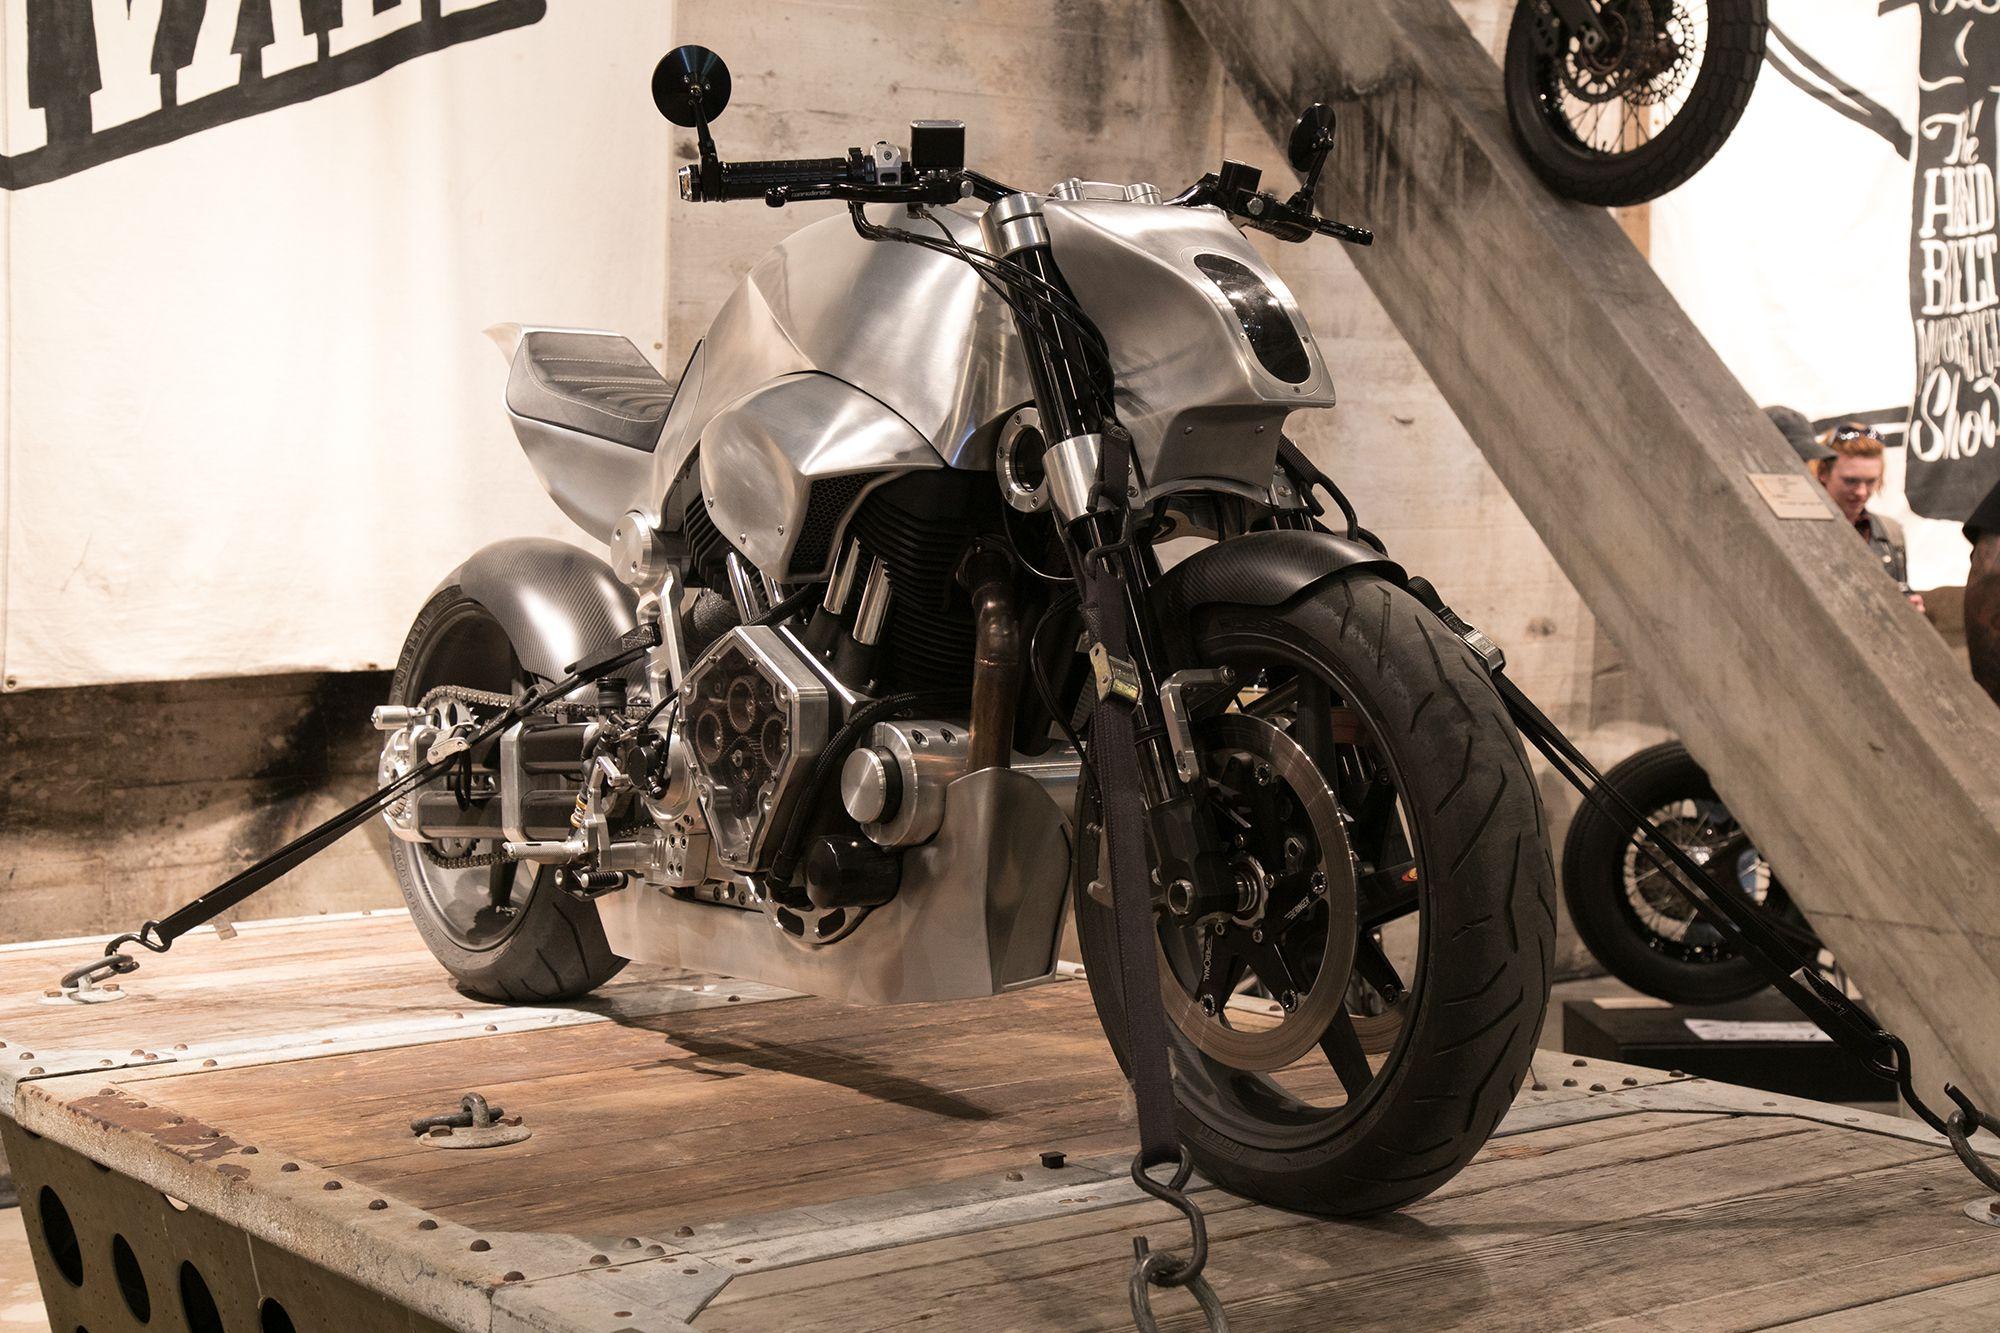 The Handbuilt Show Photo Gallery | Motorcyclist